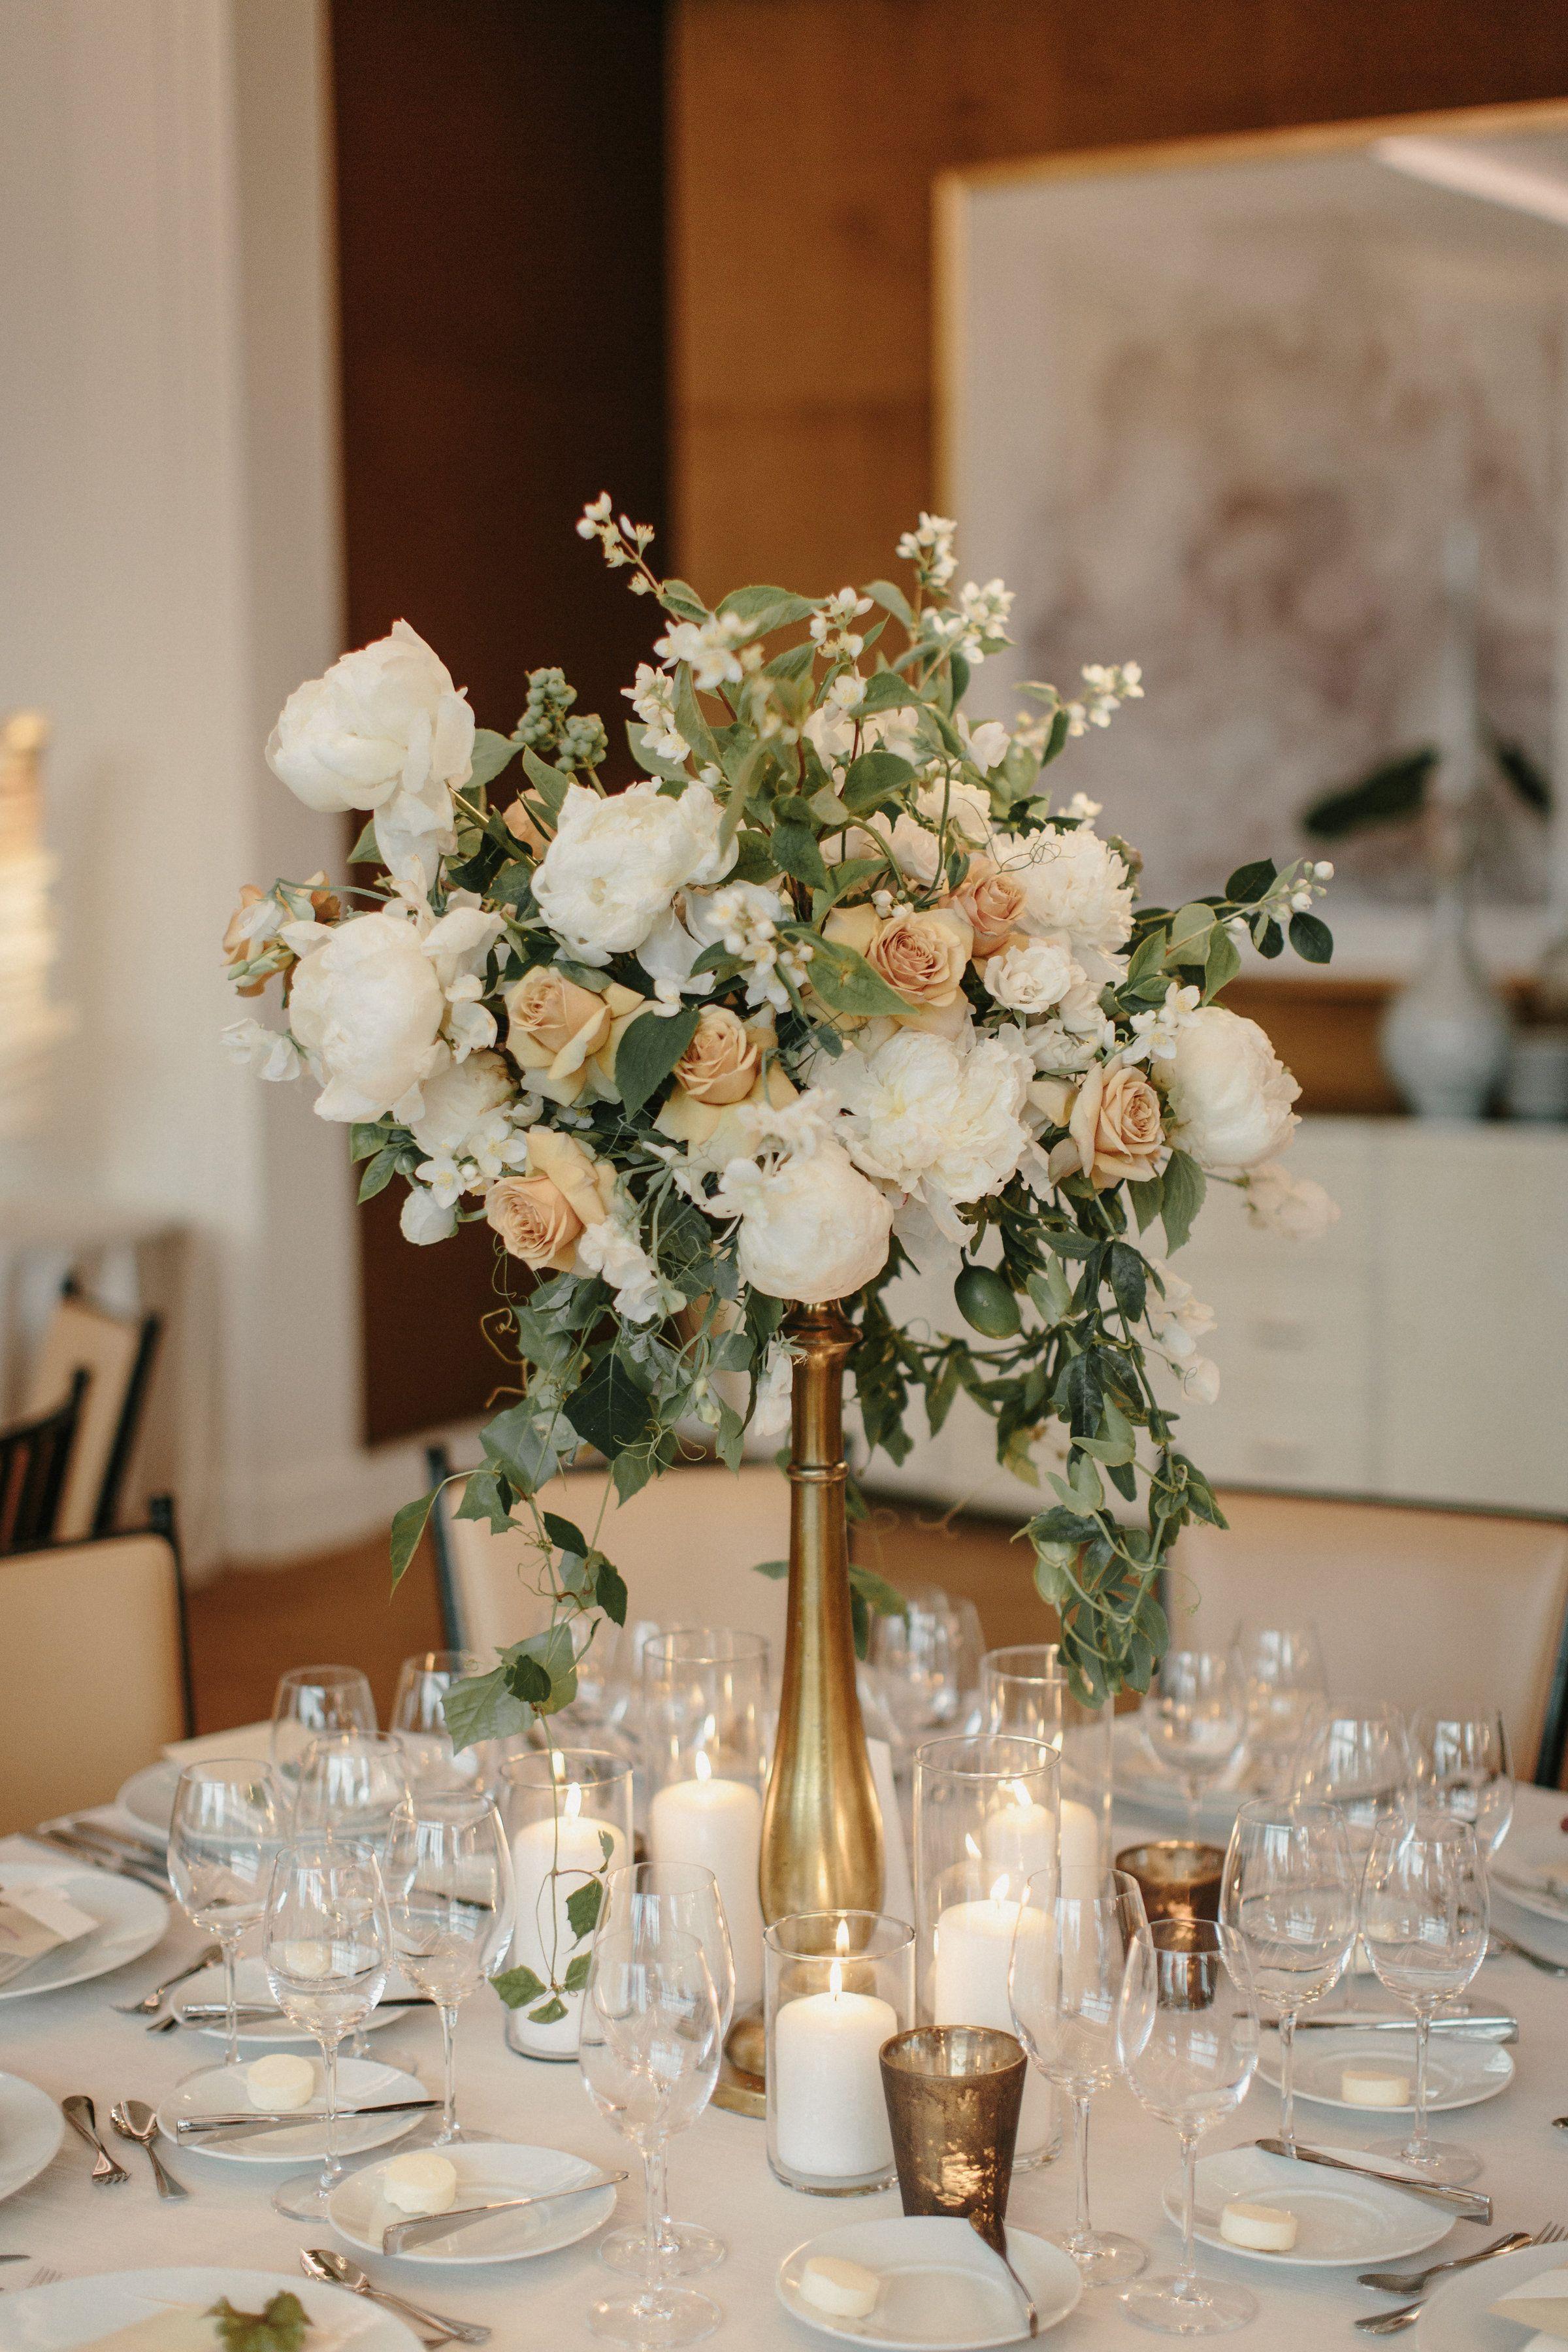 Modern Wedding Decor Trends | Wedding, Wedding decorations ...